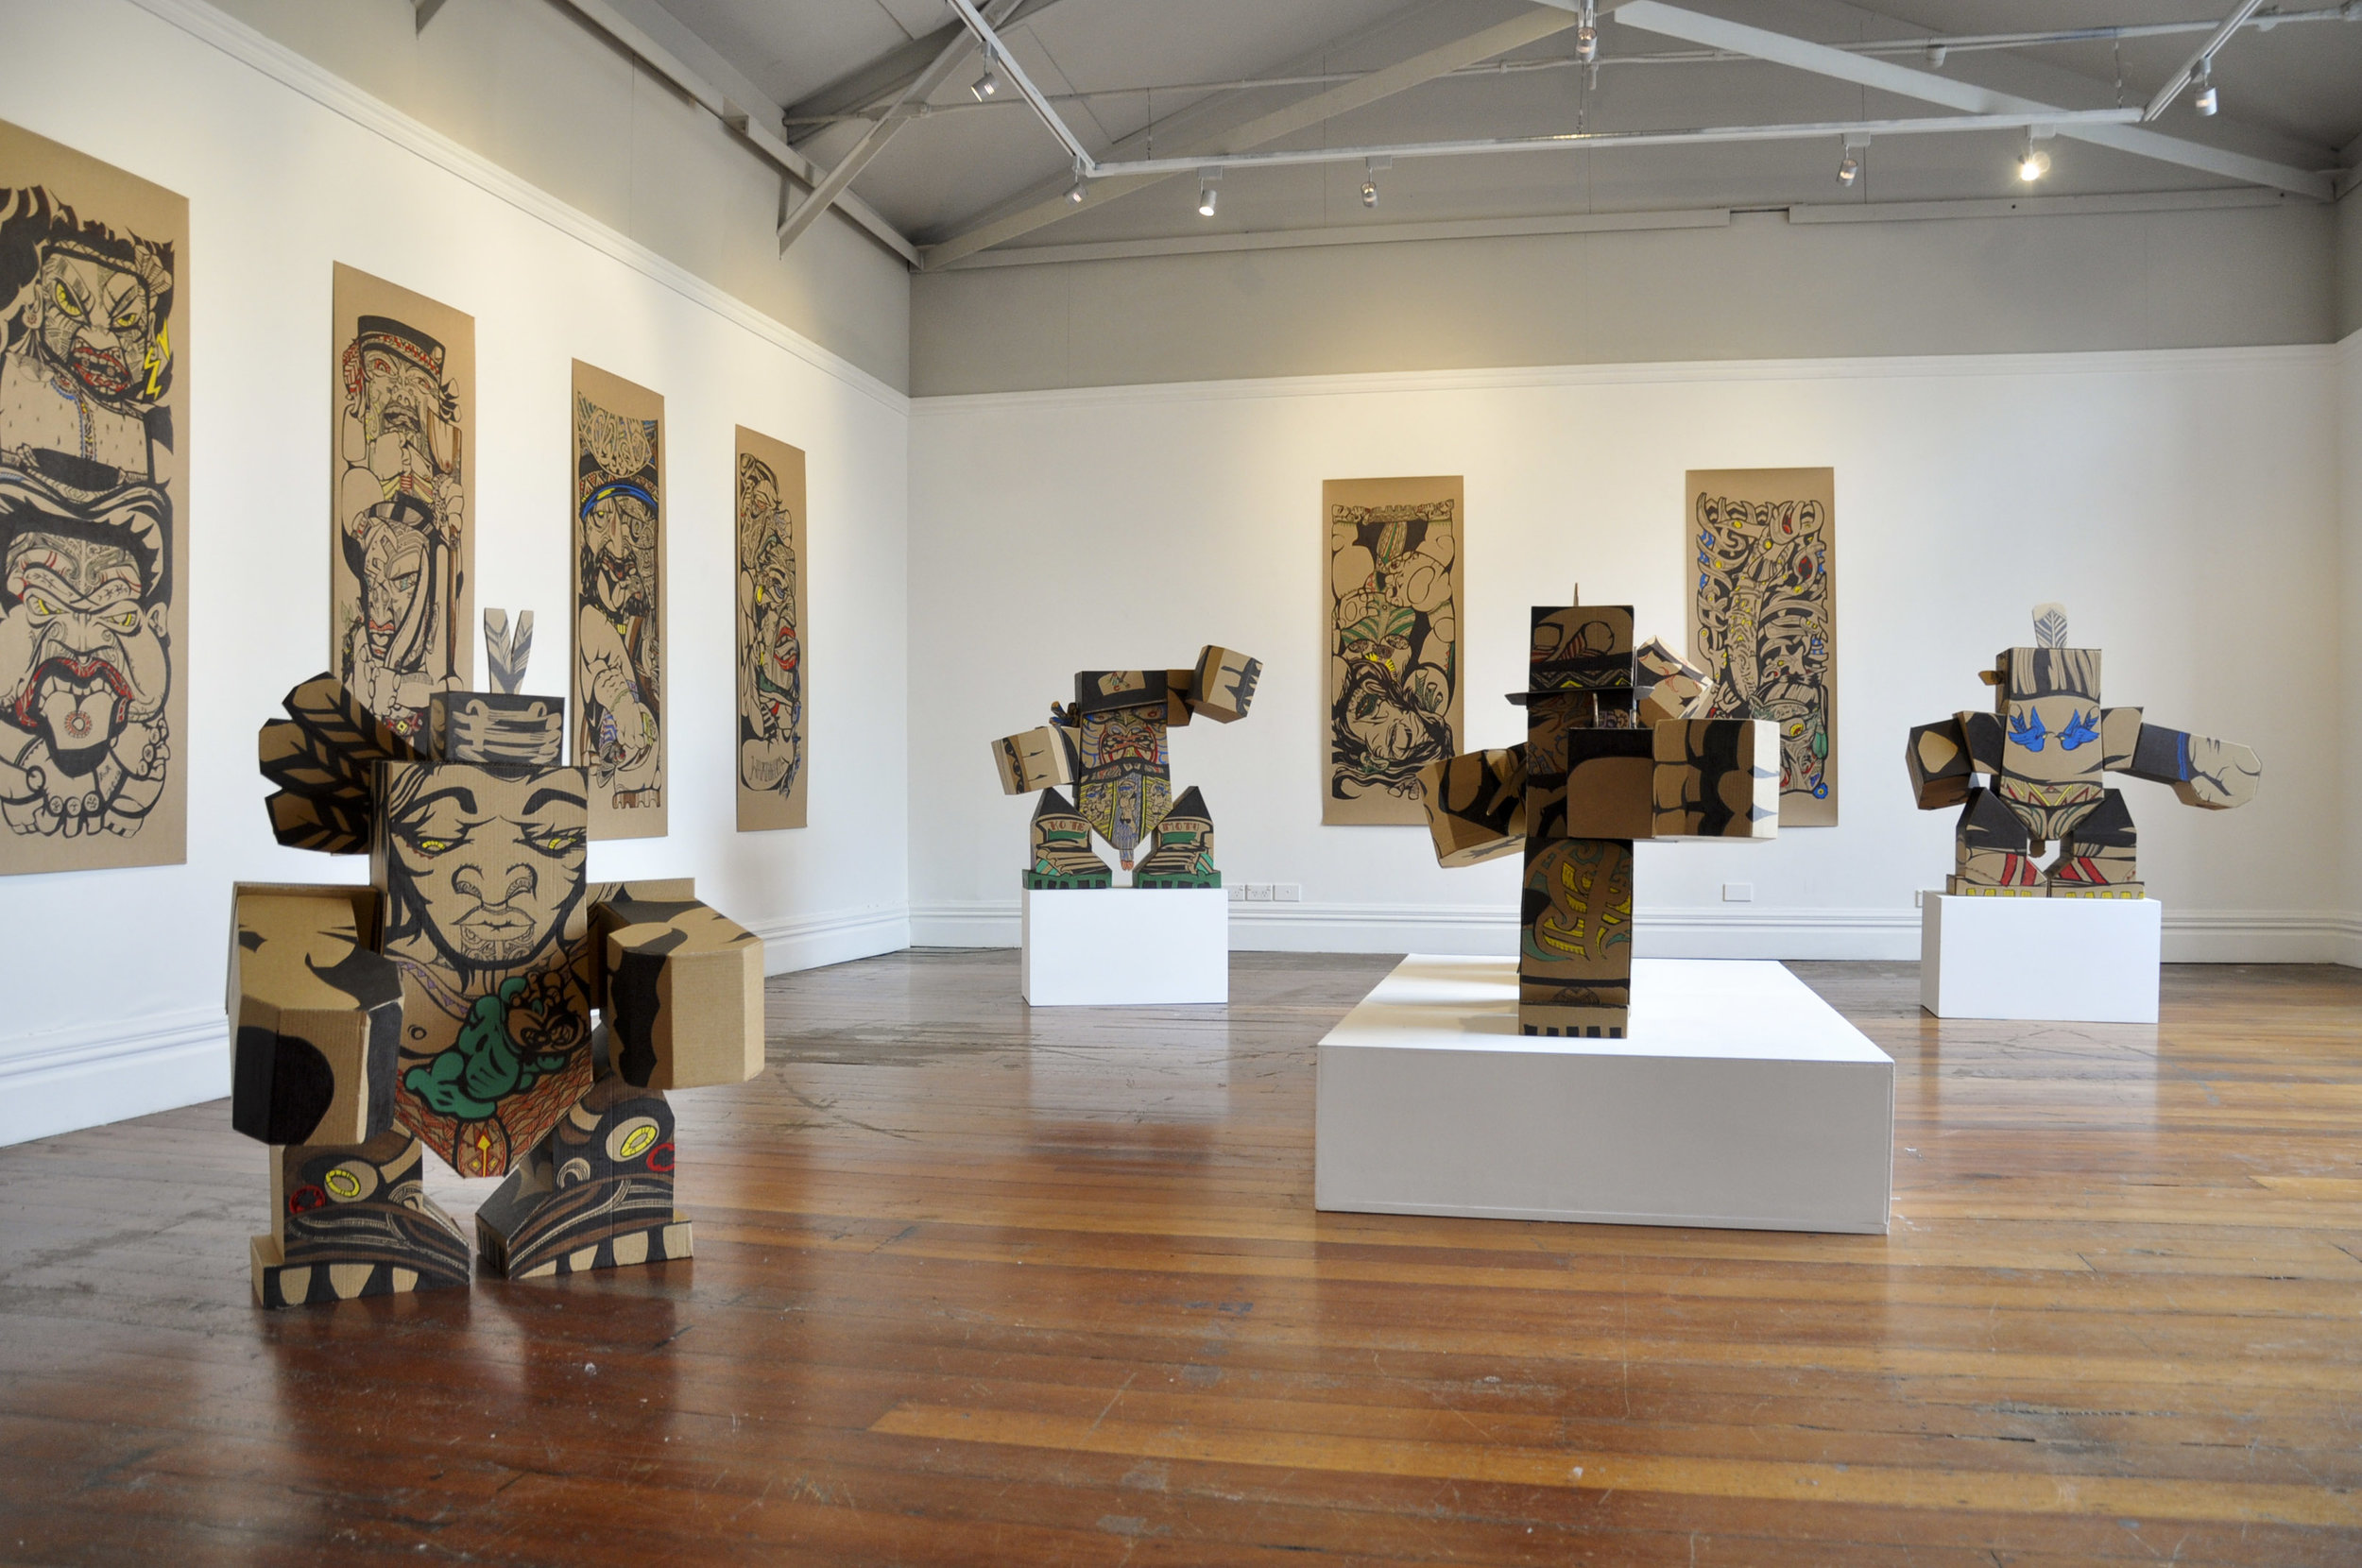 Reweti Arapere  Rakau Matarau  installation view. Image courtesy of the artist and Enjoy Gallery